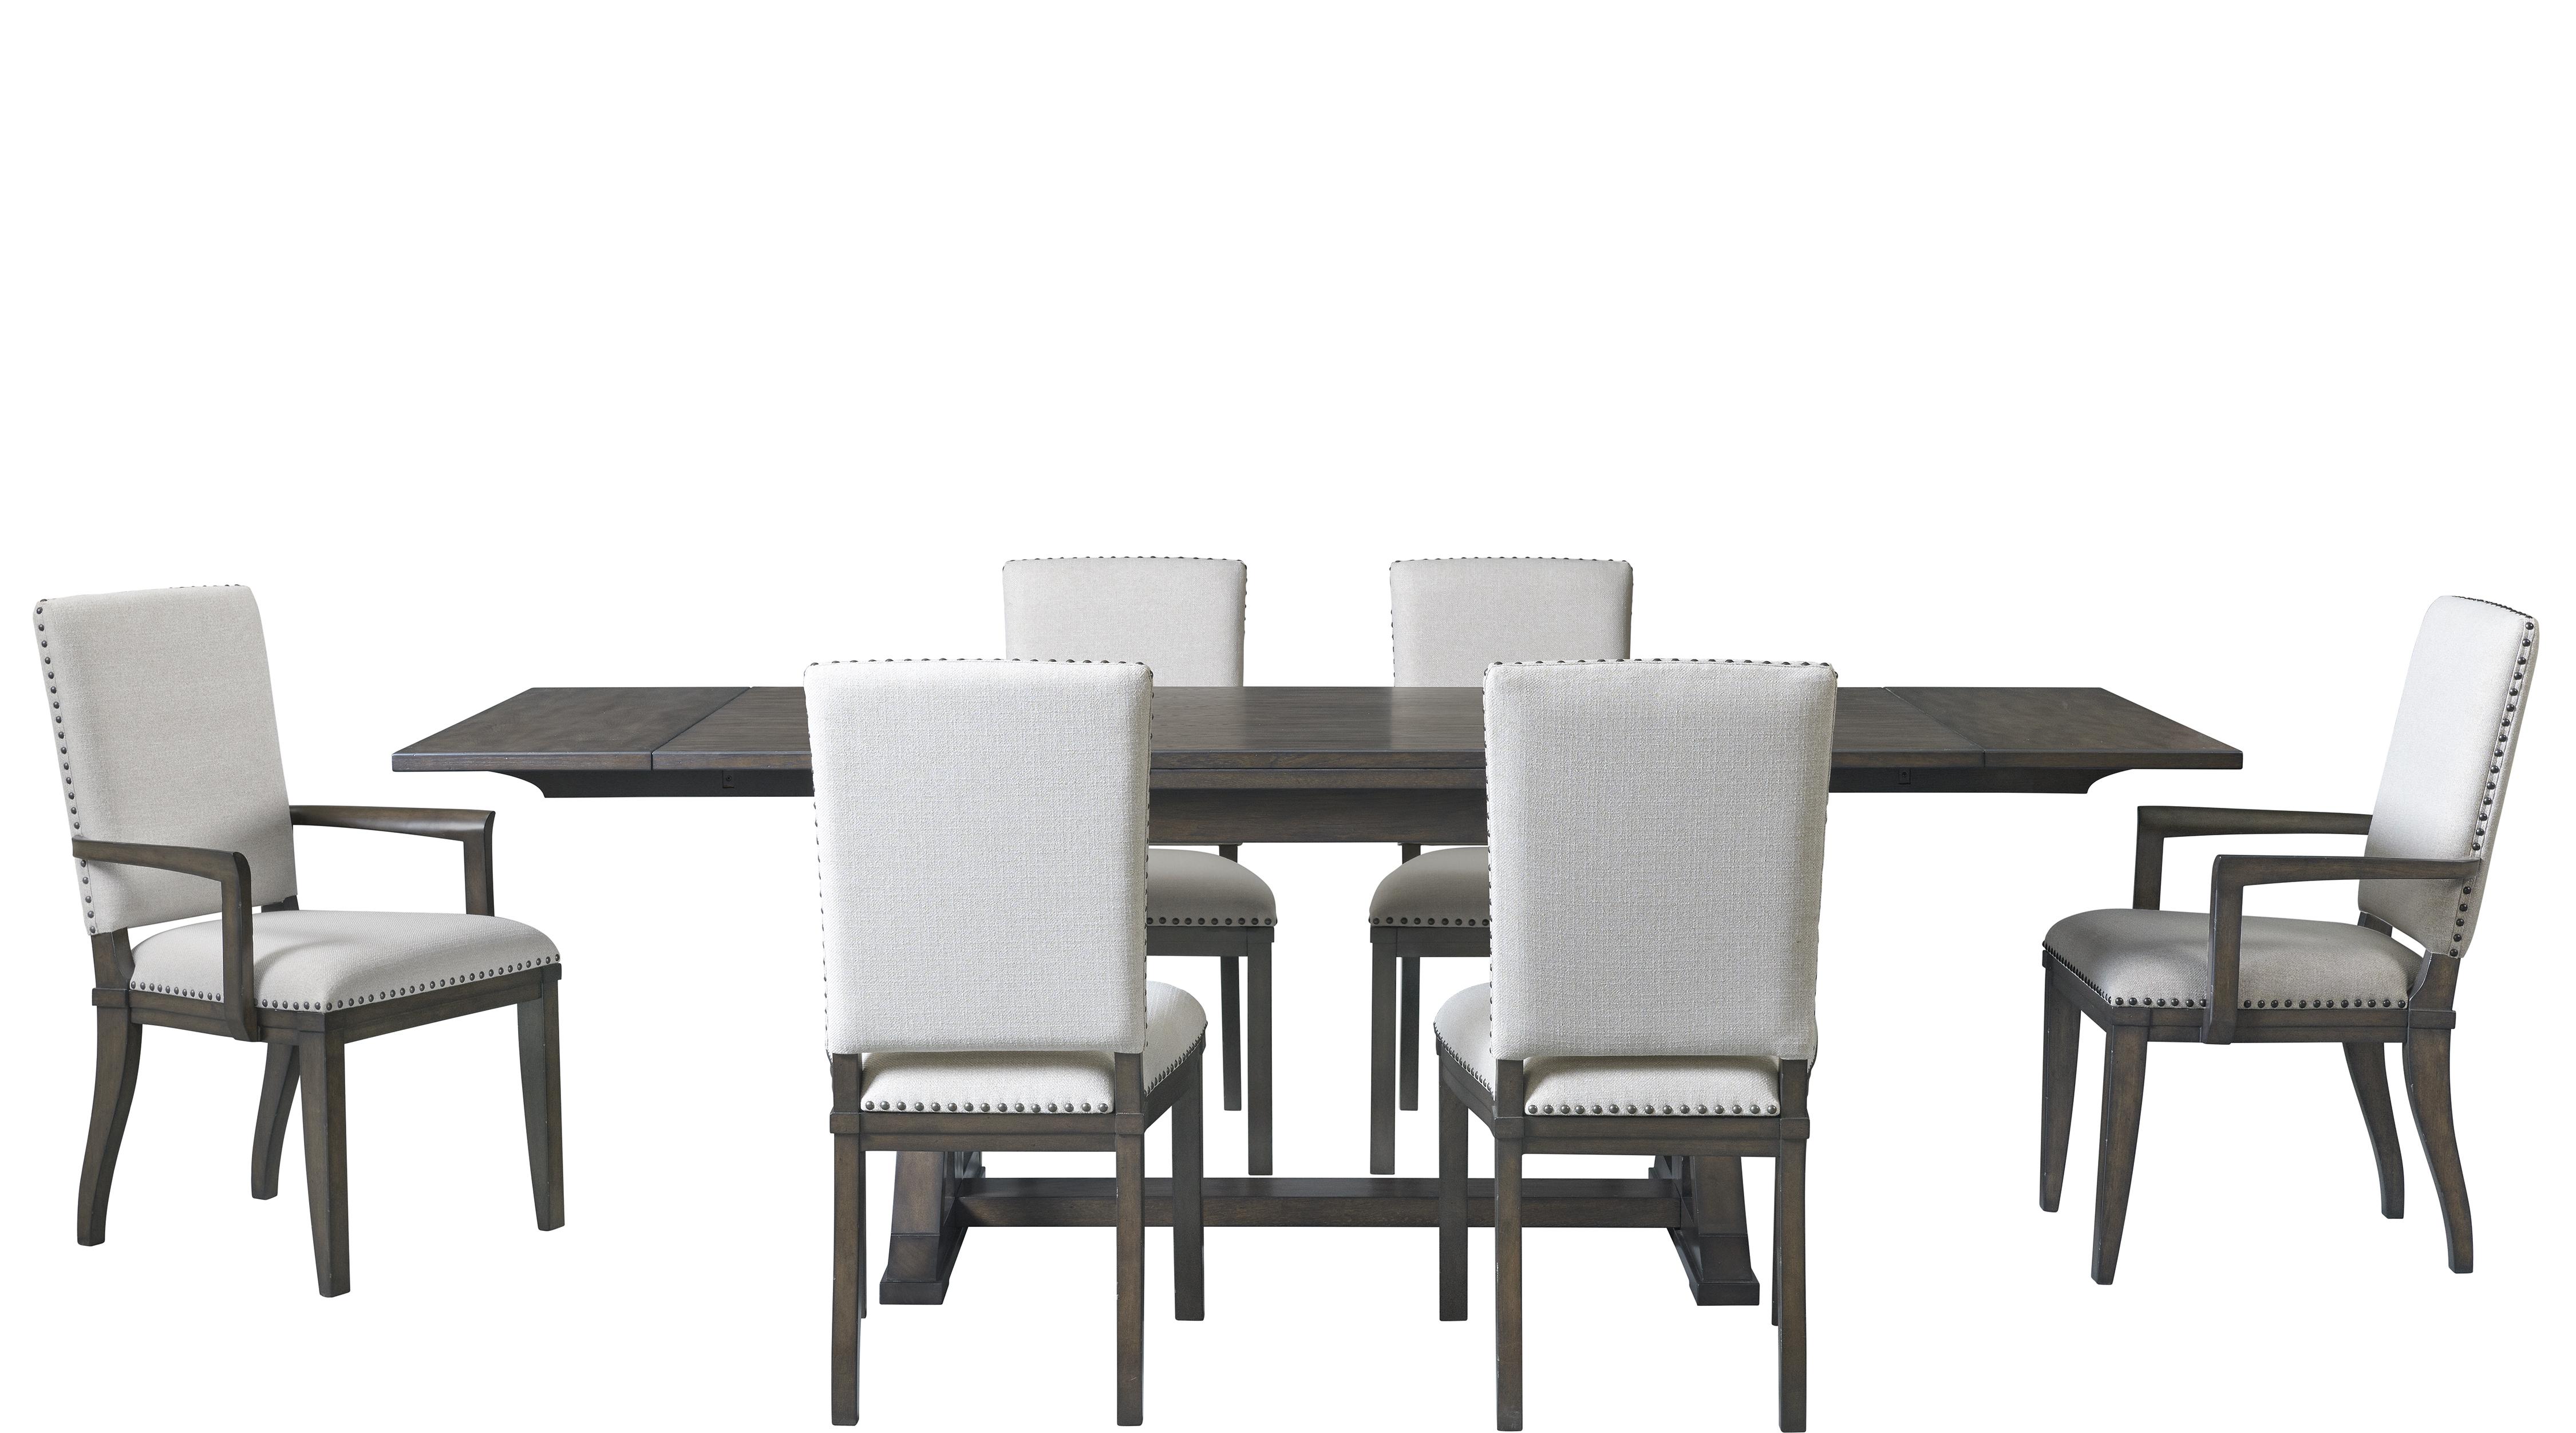 Forsyth 7-Piece Dining Set by Riverside Furniture at Prime Brothers Furniture